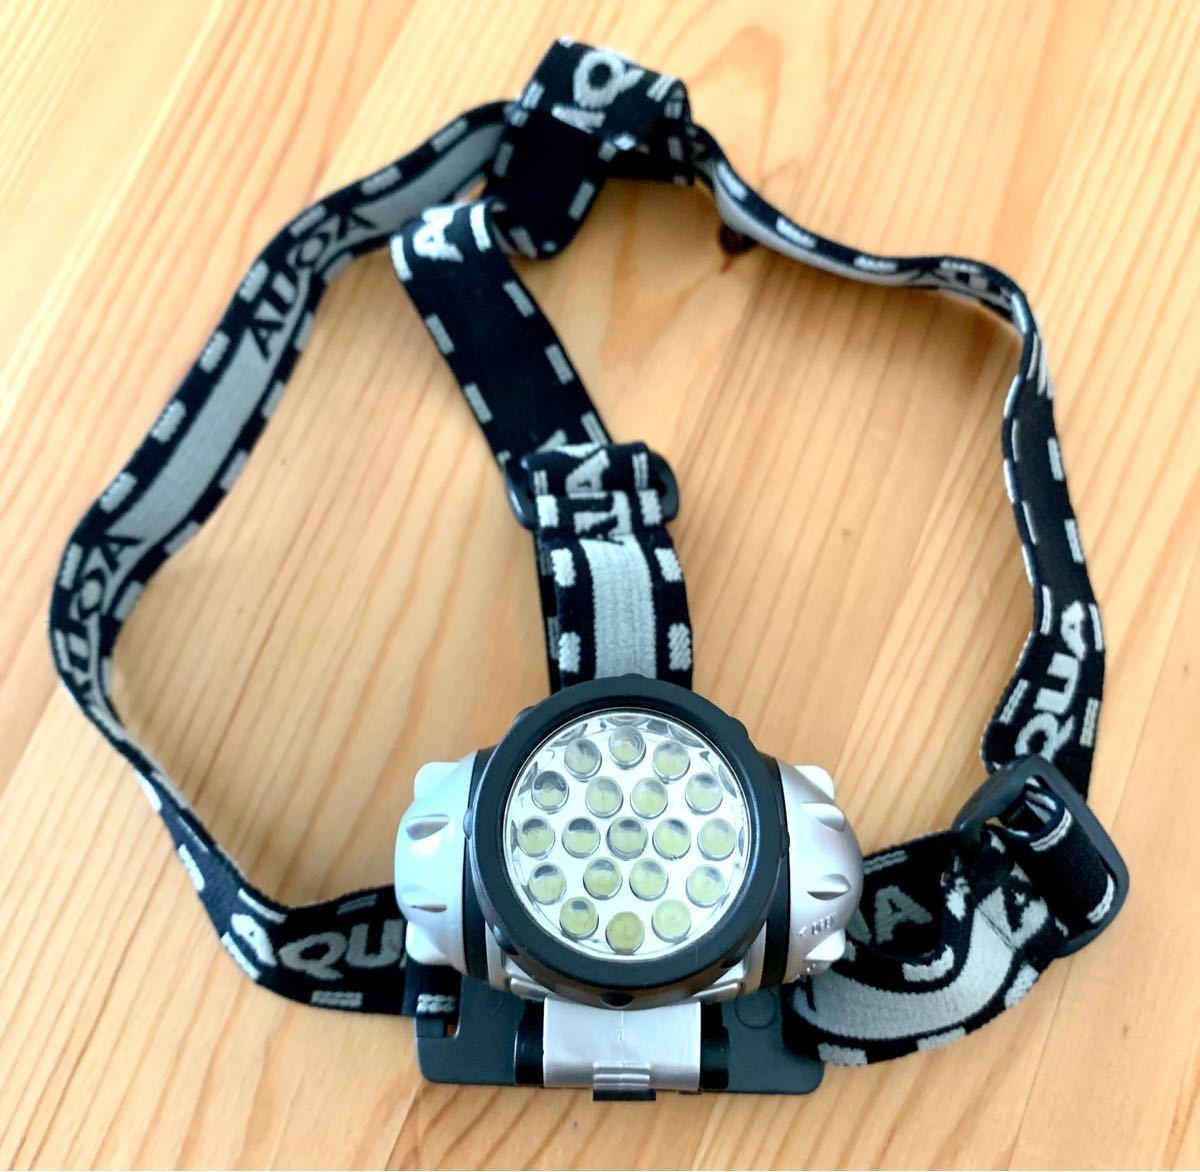 LED ヘッドライト 懐中電灯 ハンディライト 軽量コンパクト アウトドア防災用